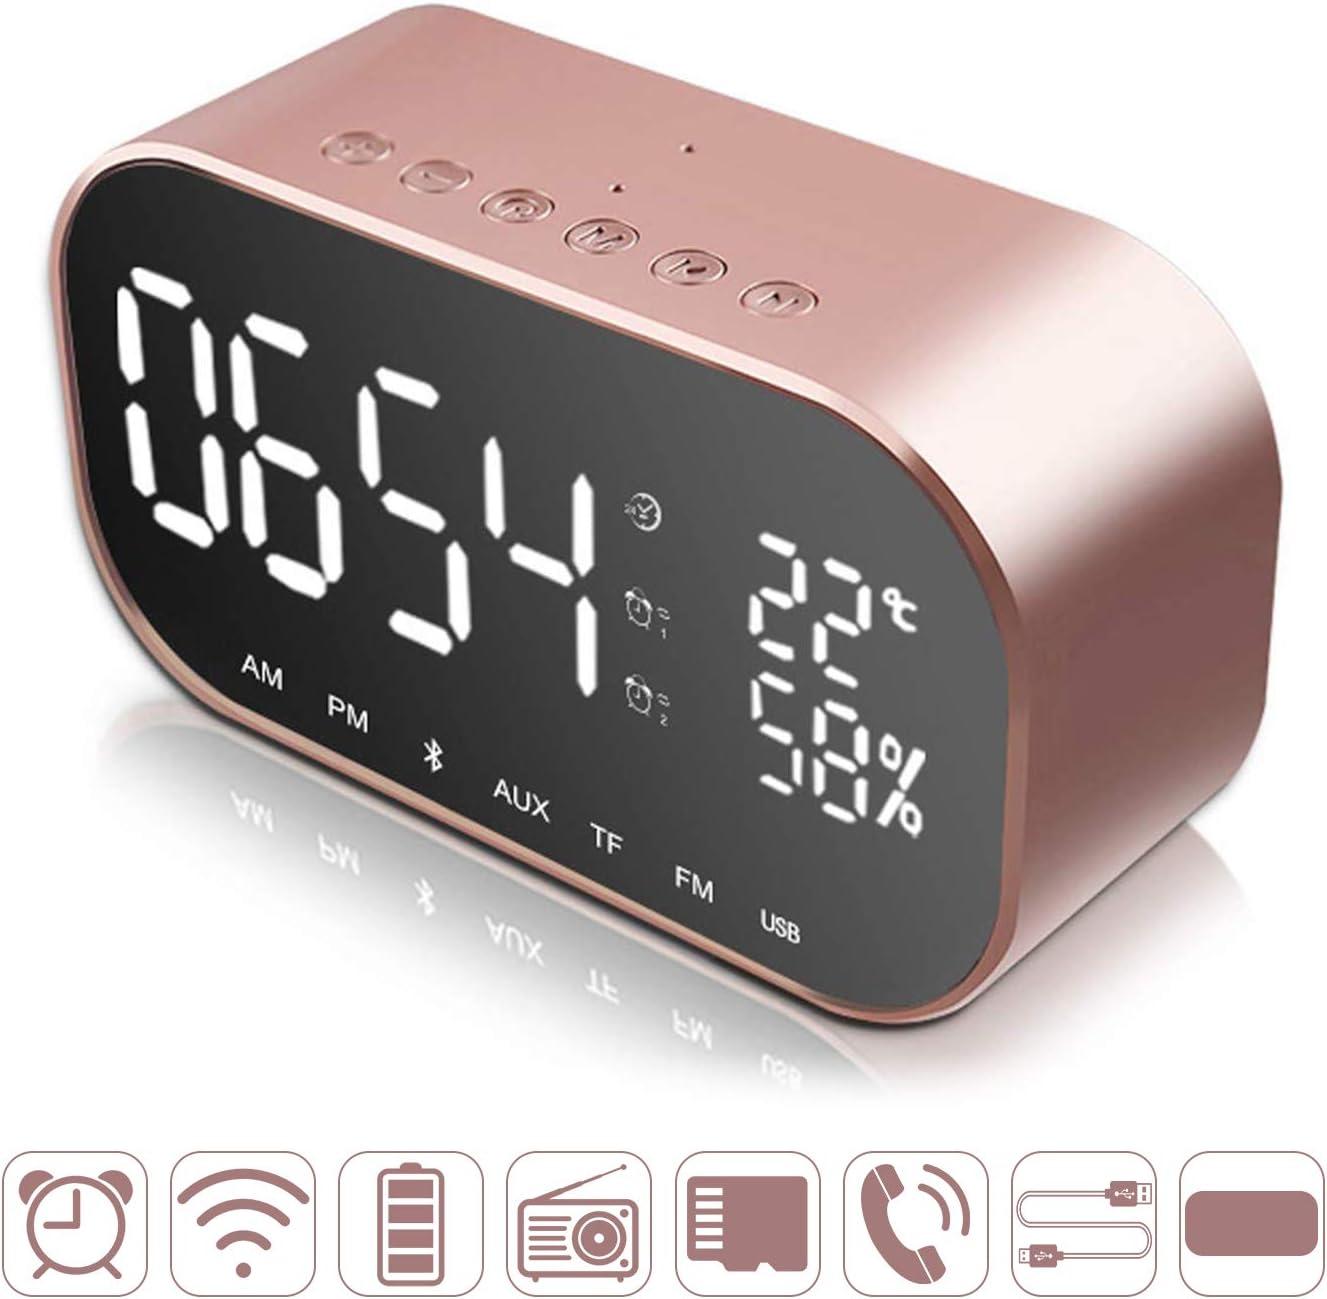 Digital Alarm Clock Wireless Bluetooth Speaker Dual 3W Driver Stereo Speaker,FM Radio,4.2 Bluetooth Digital Clocks Bedside with Dual USB Charging Port MP3 Music Player Card